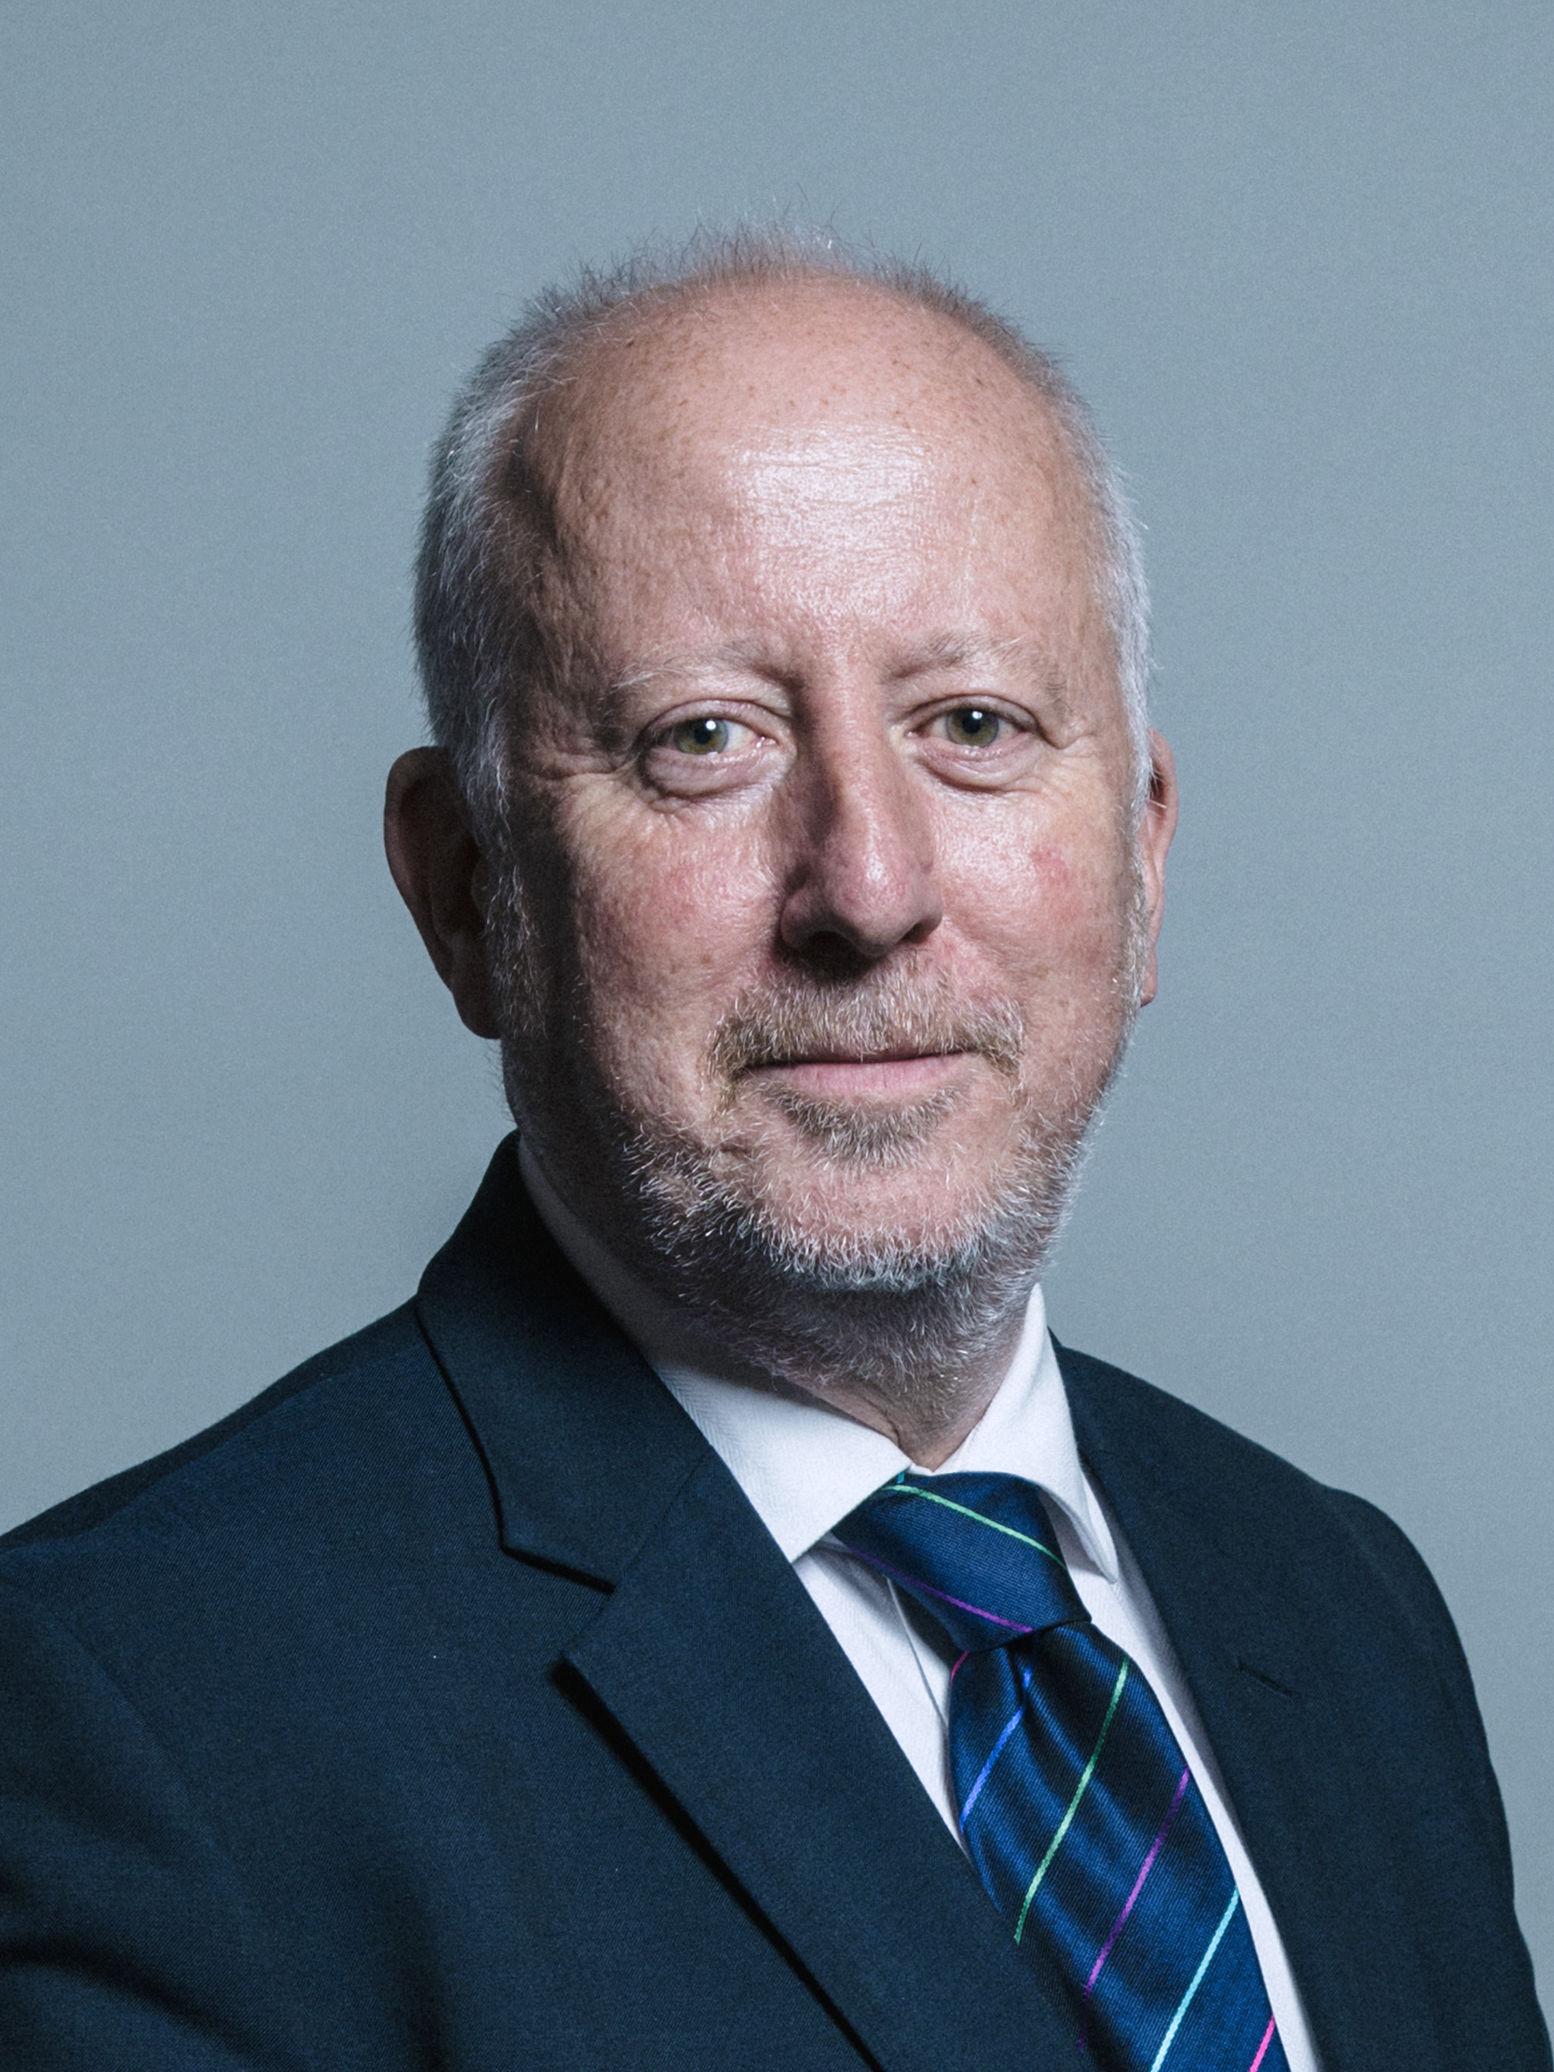 Andy McDonald (politician) - Wikipedia